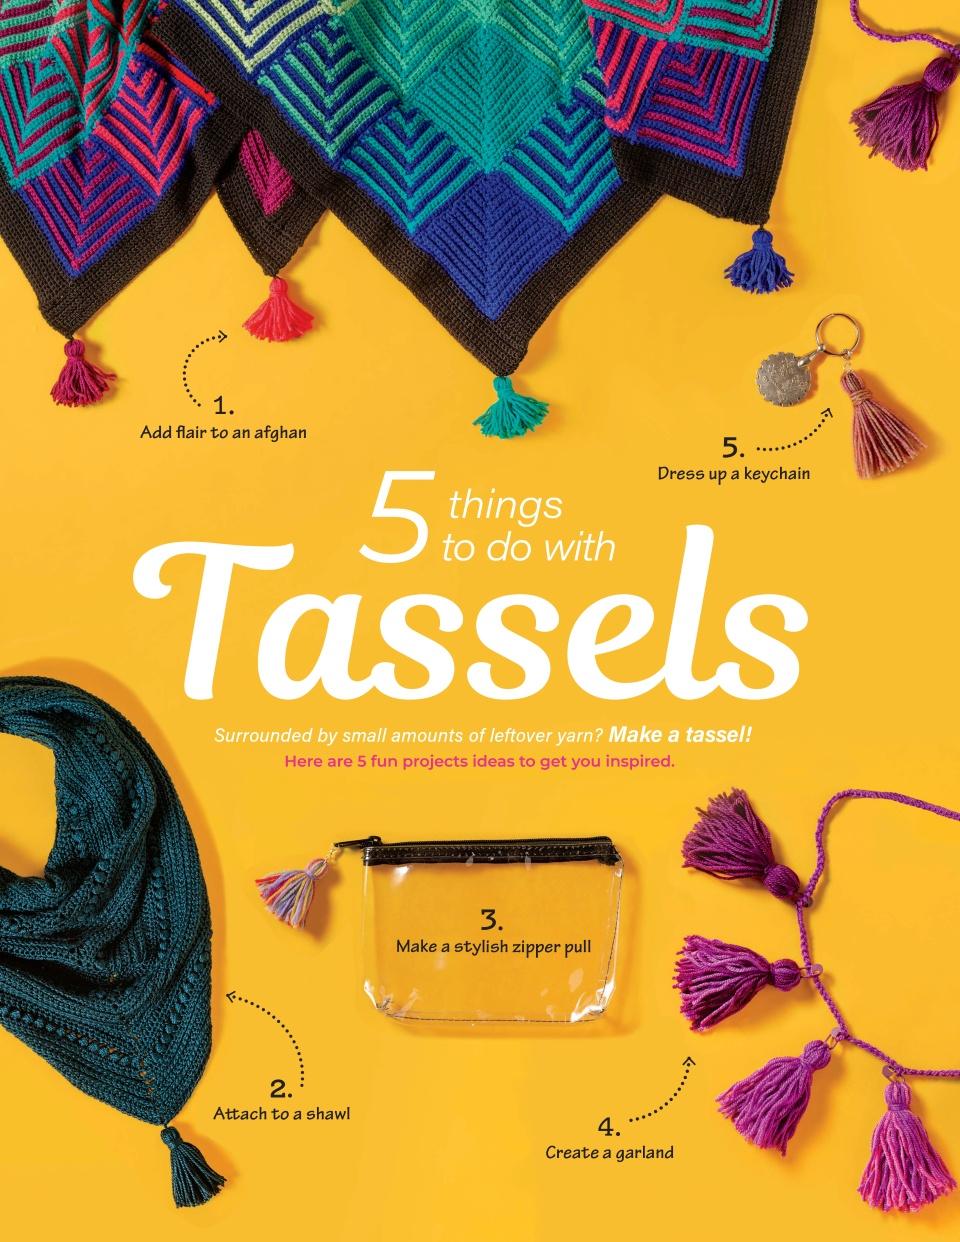 Tassel Projects